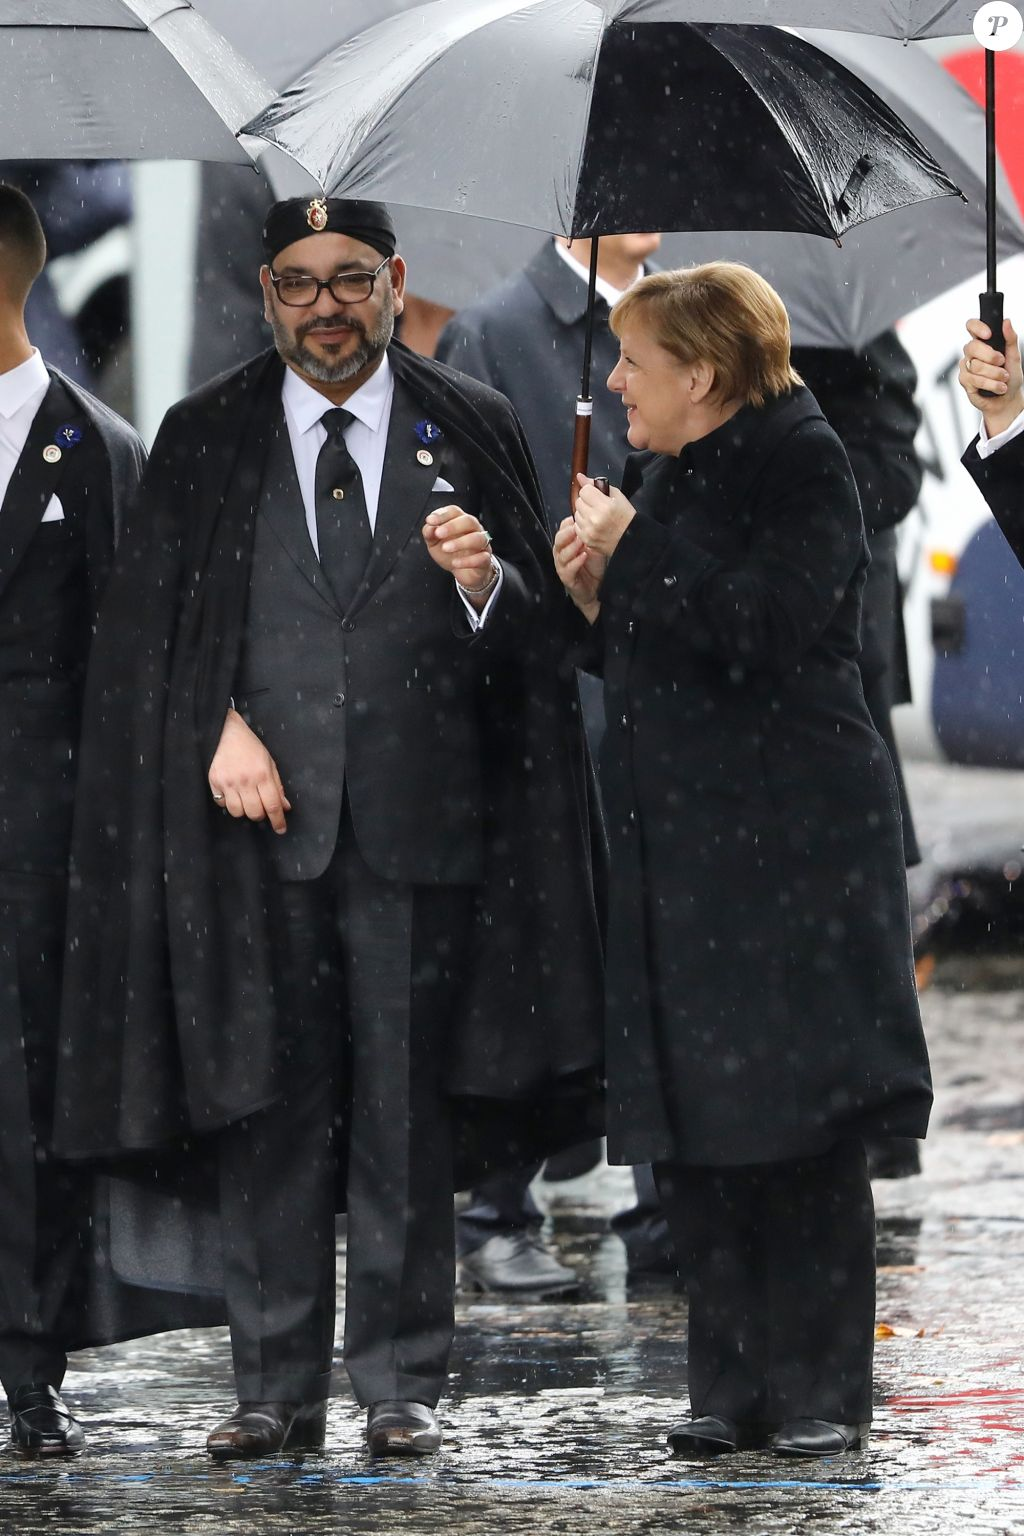 Diplomatie marocaine - Relations internationales 4422164-le-roi-mohammed-vi-du-maroc-et-angela-me-1024x0-2